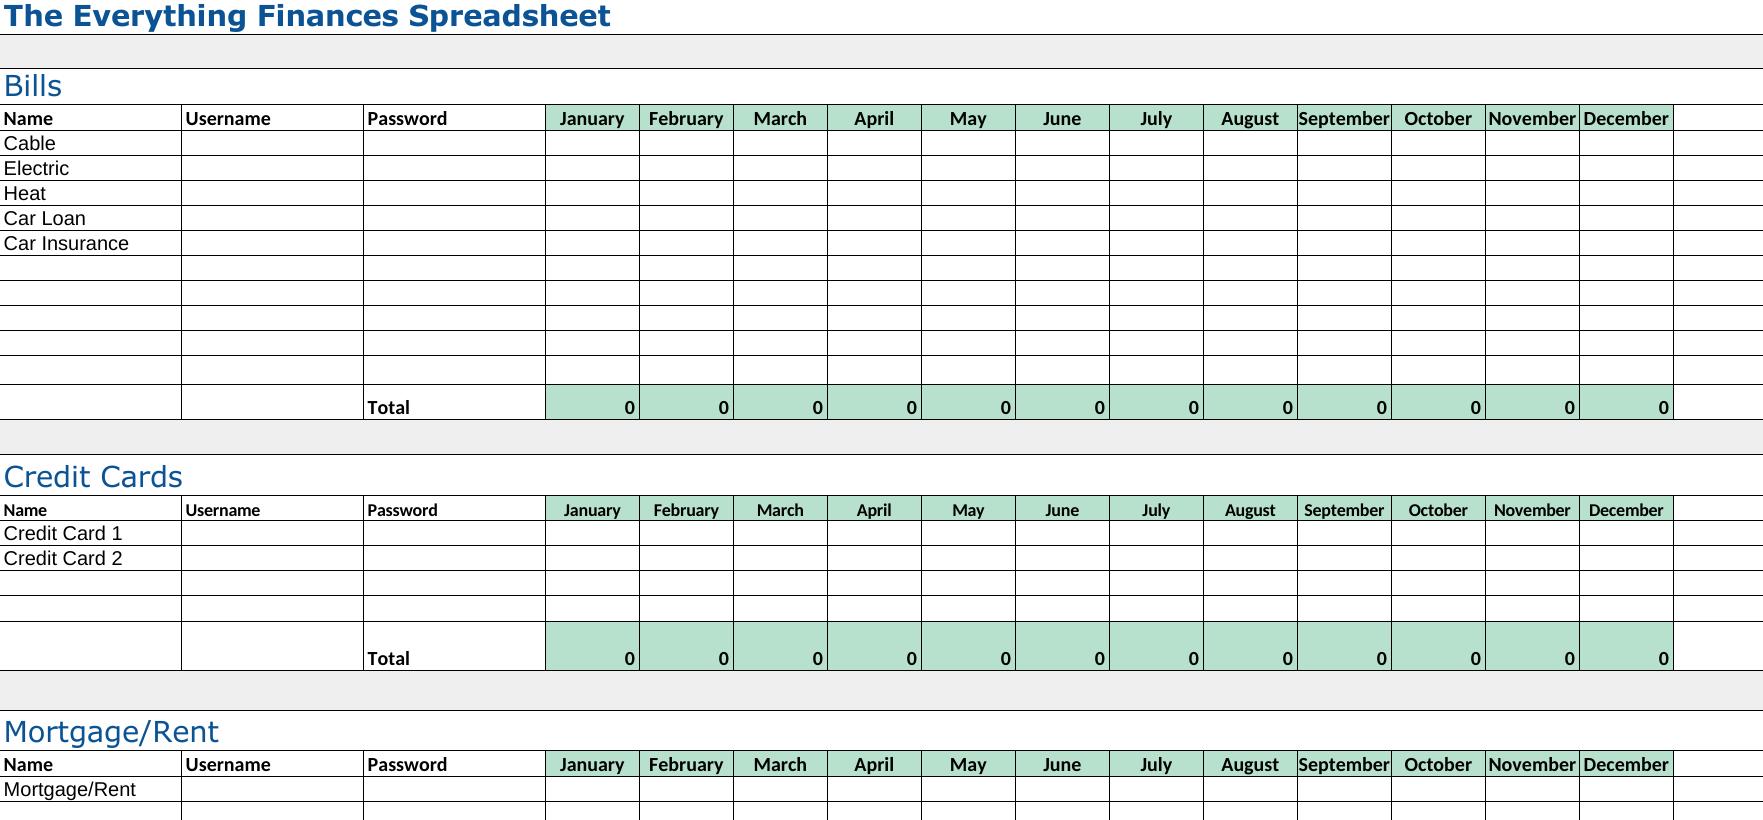 Mortgage Refinance Comparison Spreadsheet